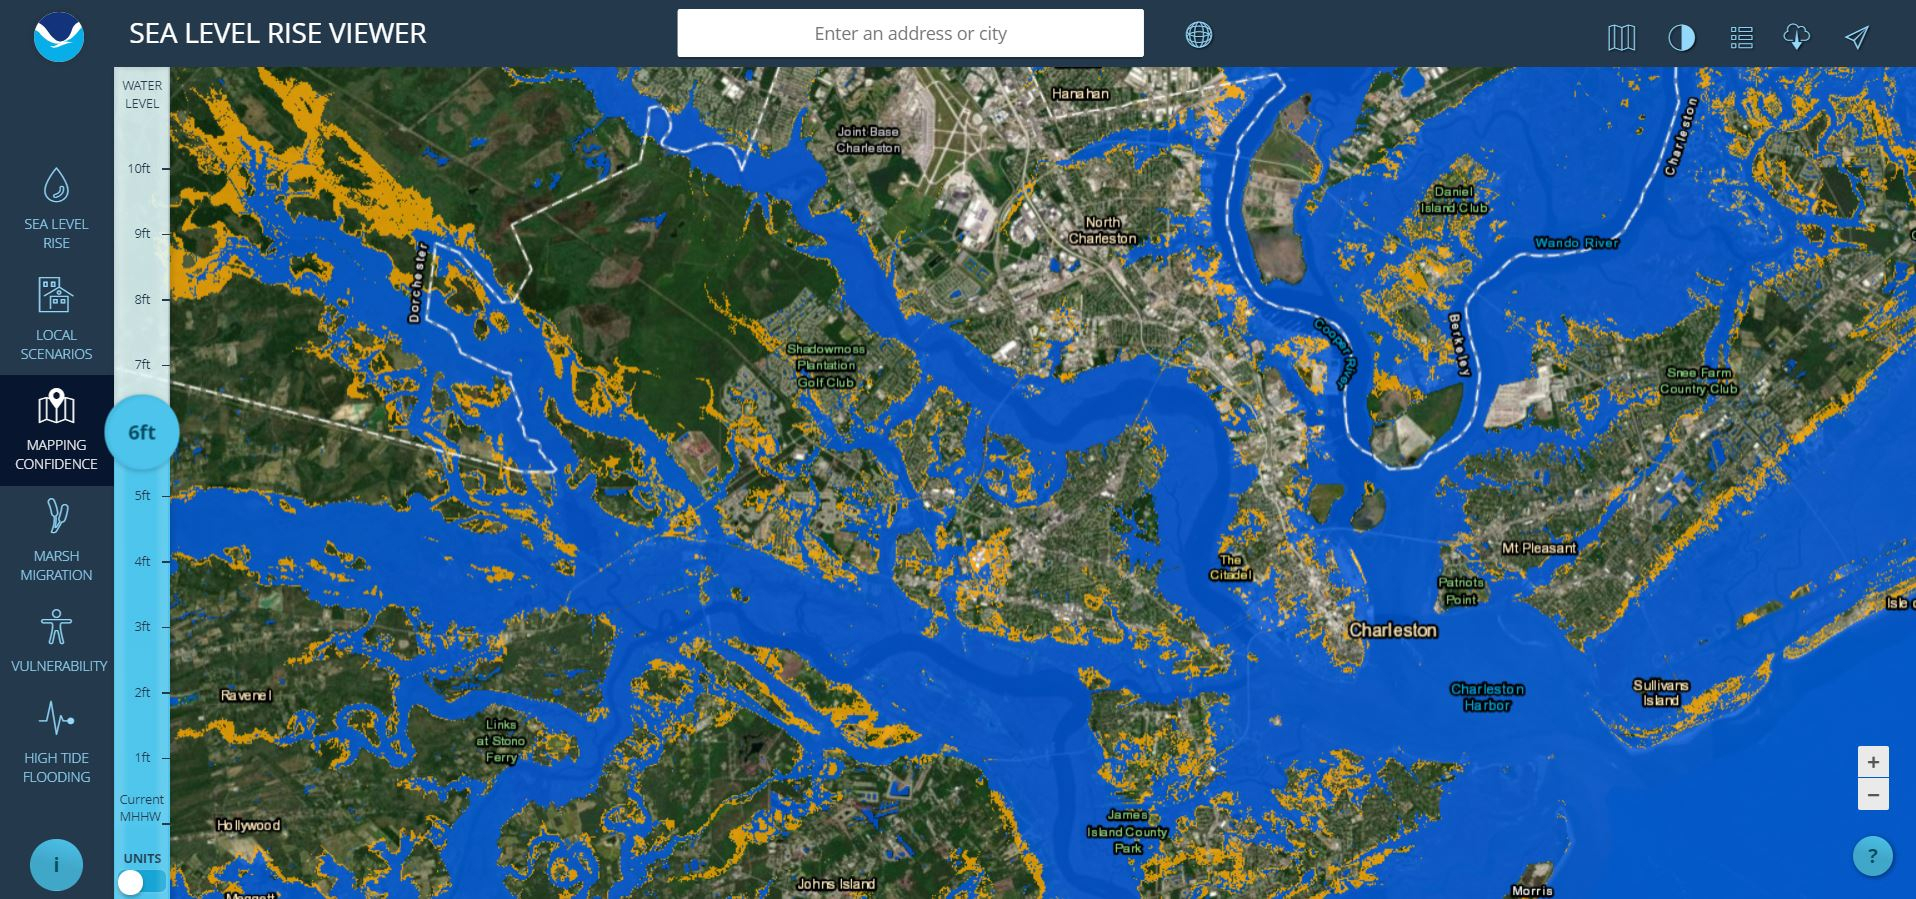 Sea Level Rise Viewer - Florida Global Warming Map